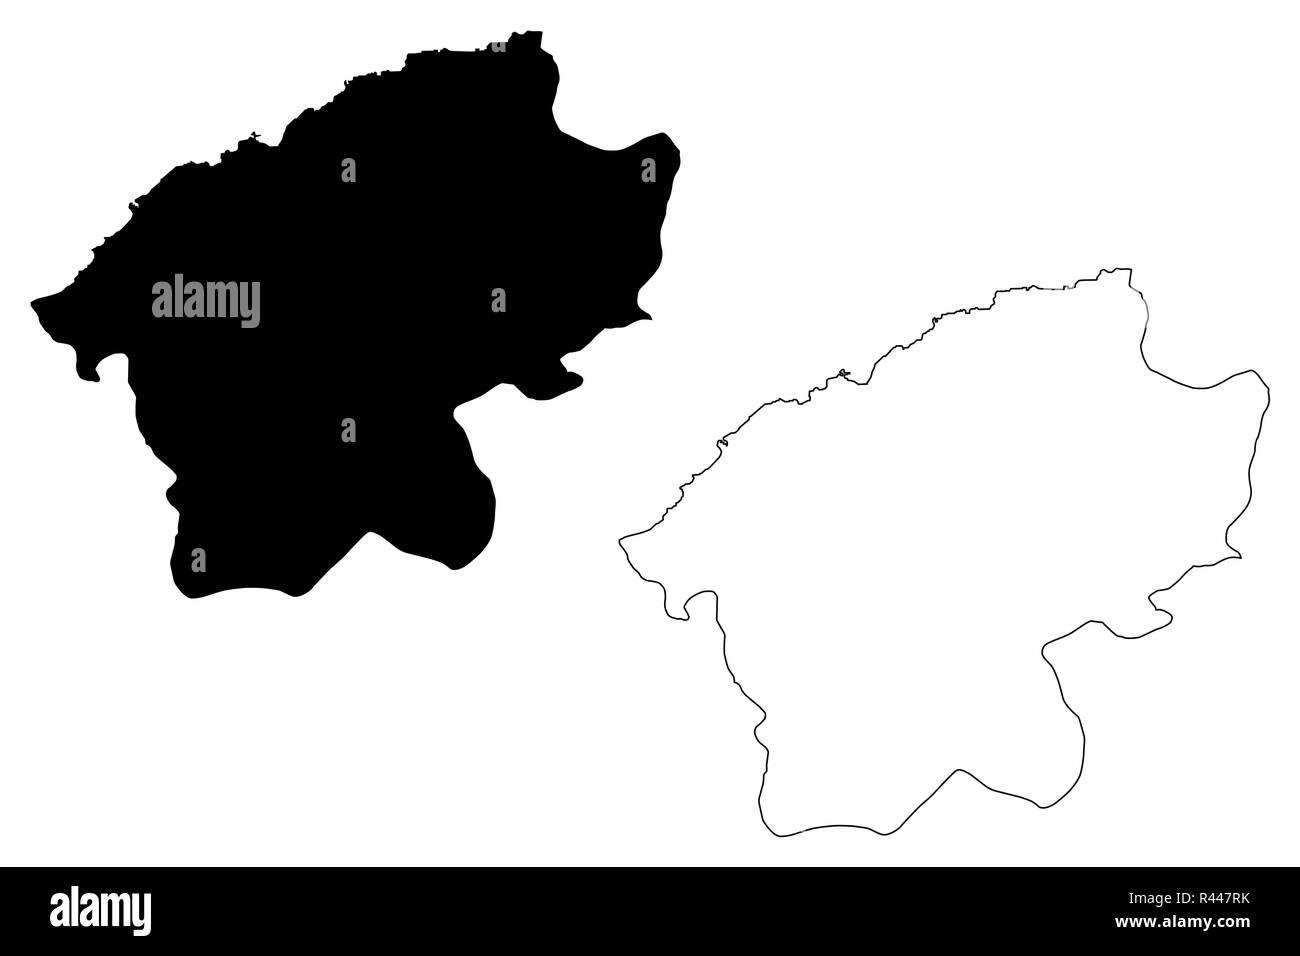 Bartin (Provinces of the Republic of Turkey) map vector illustration, scribble sketch Bartin ili map - Stock Image